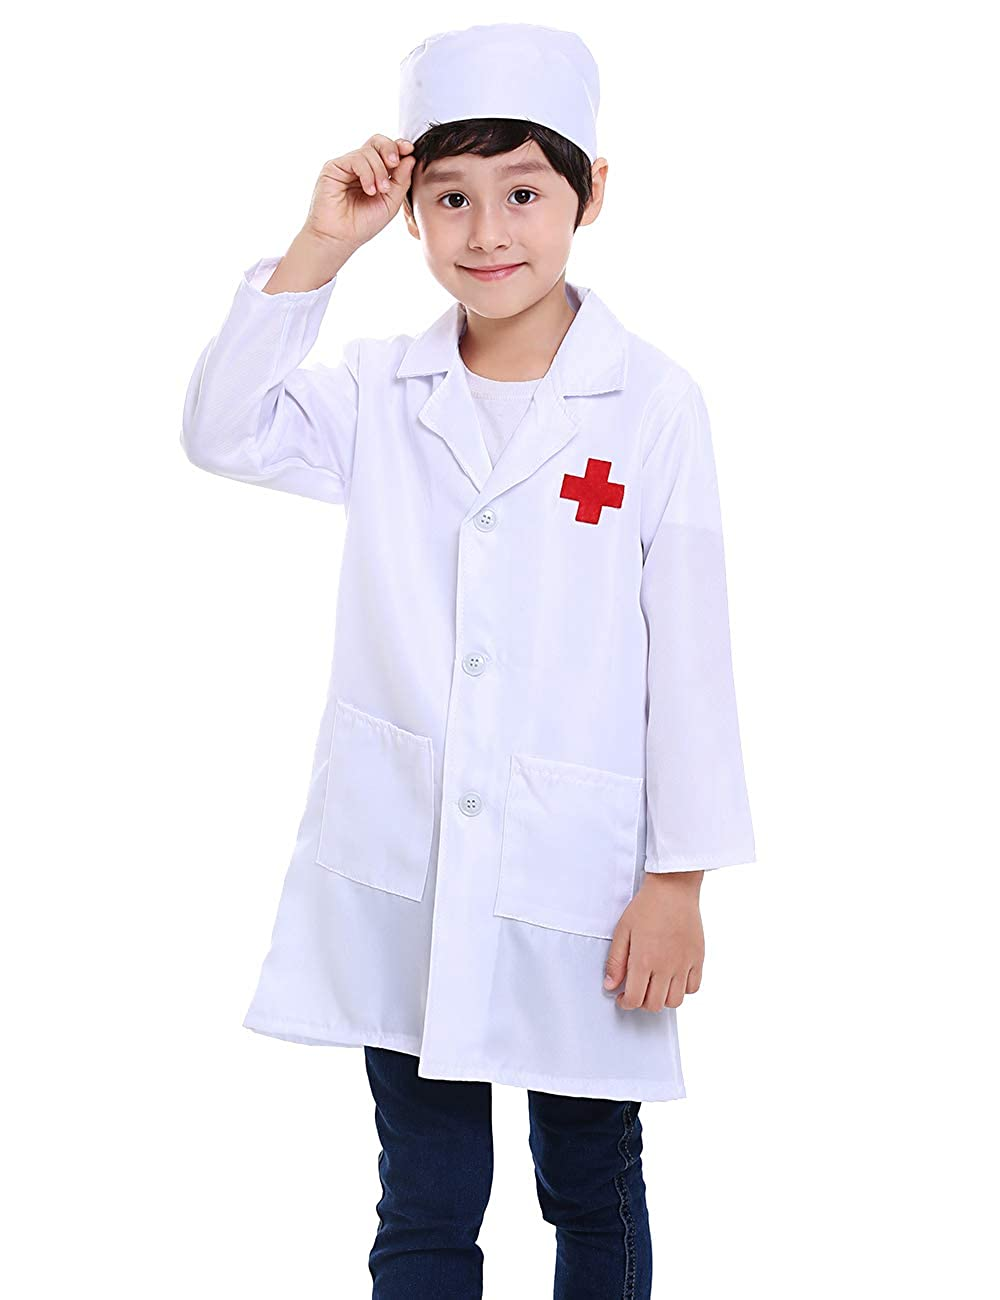 Amazon.com: TopTie niños blanco Lab abrigos niño disfraz ...